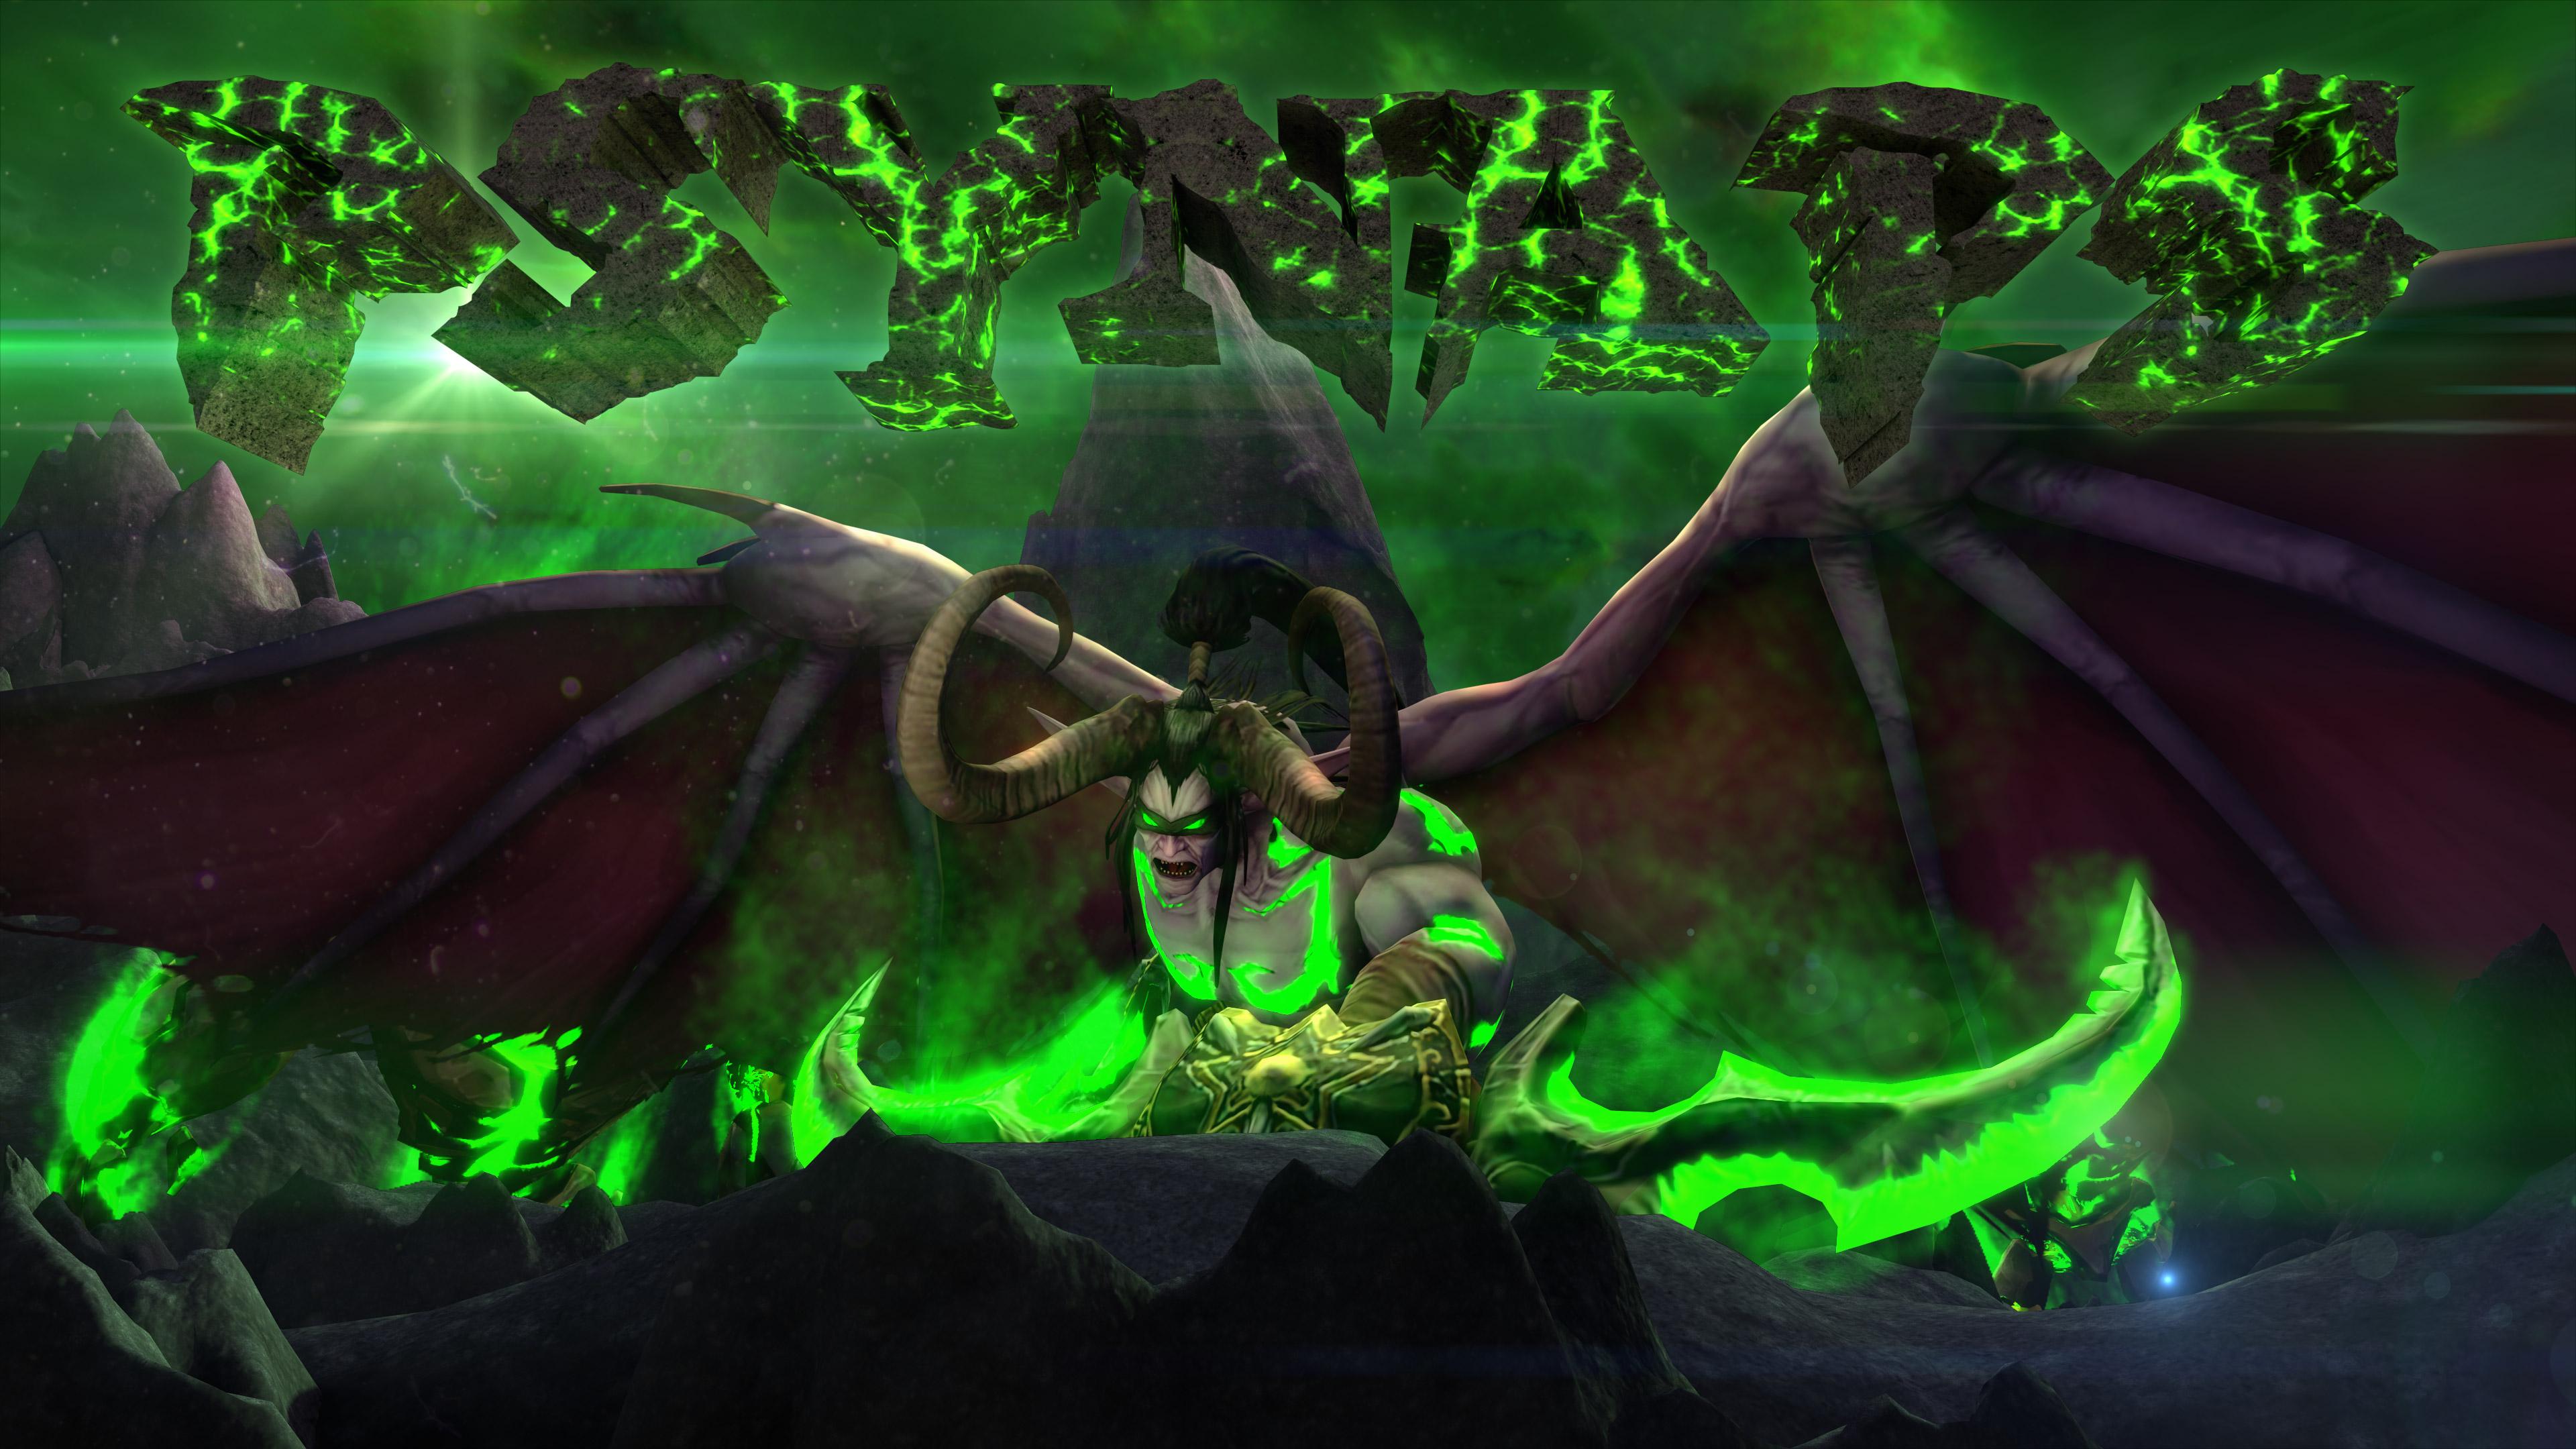 WoW Legion Illidan Custom Character 4K Wallpaper